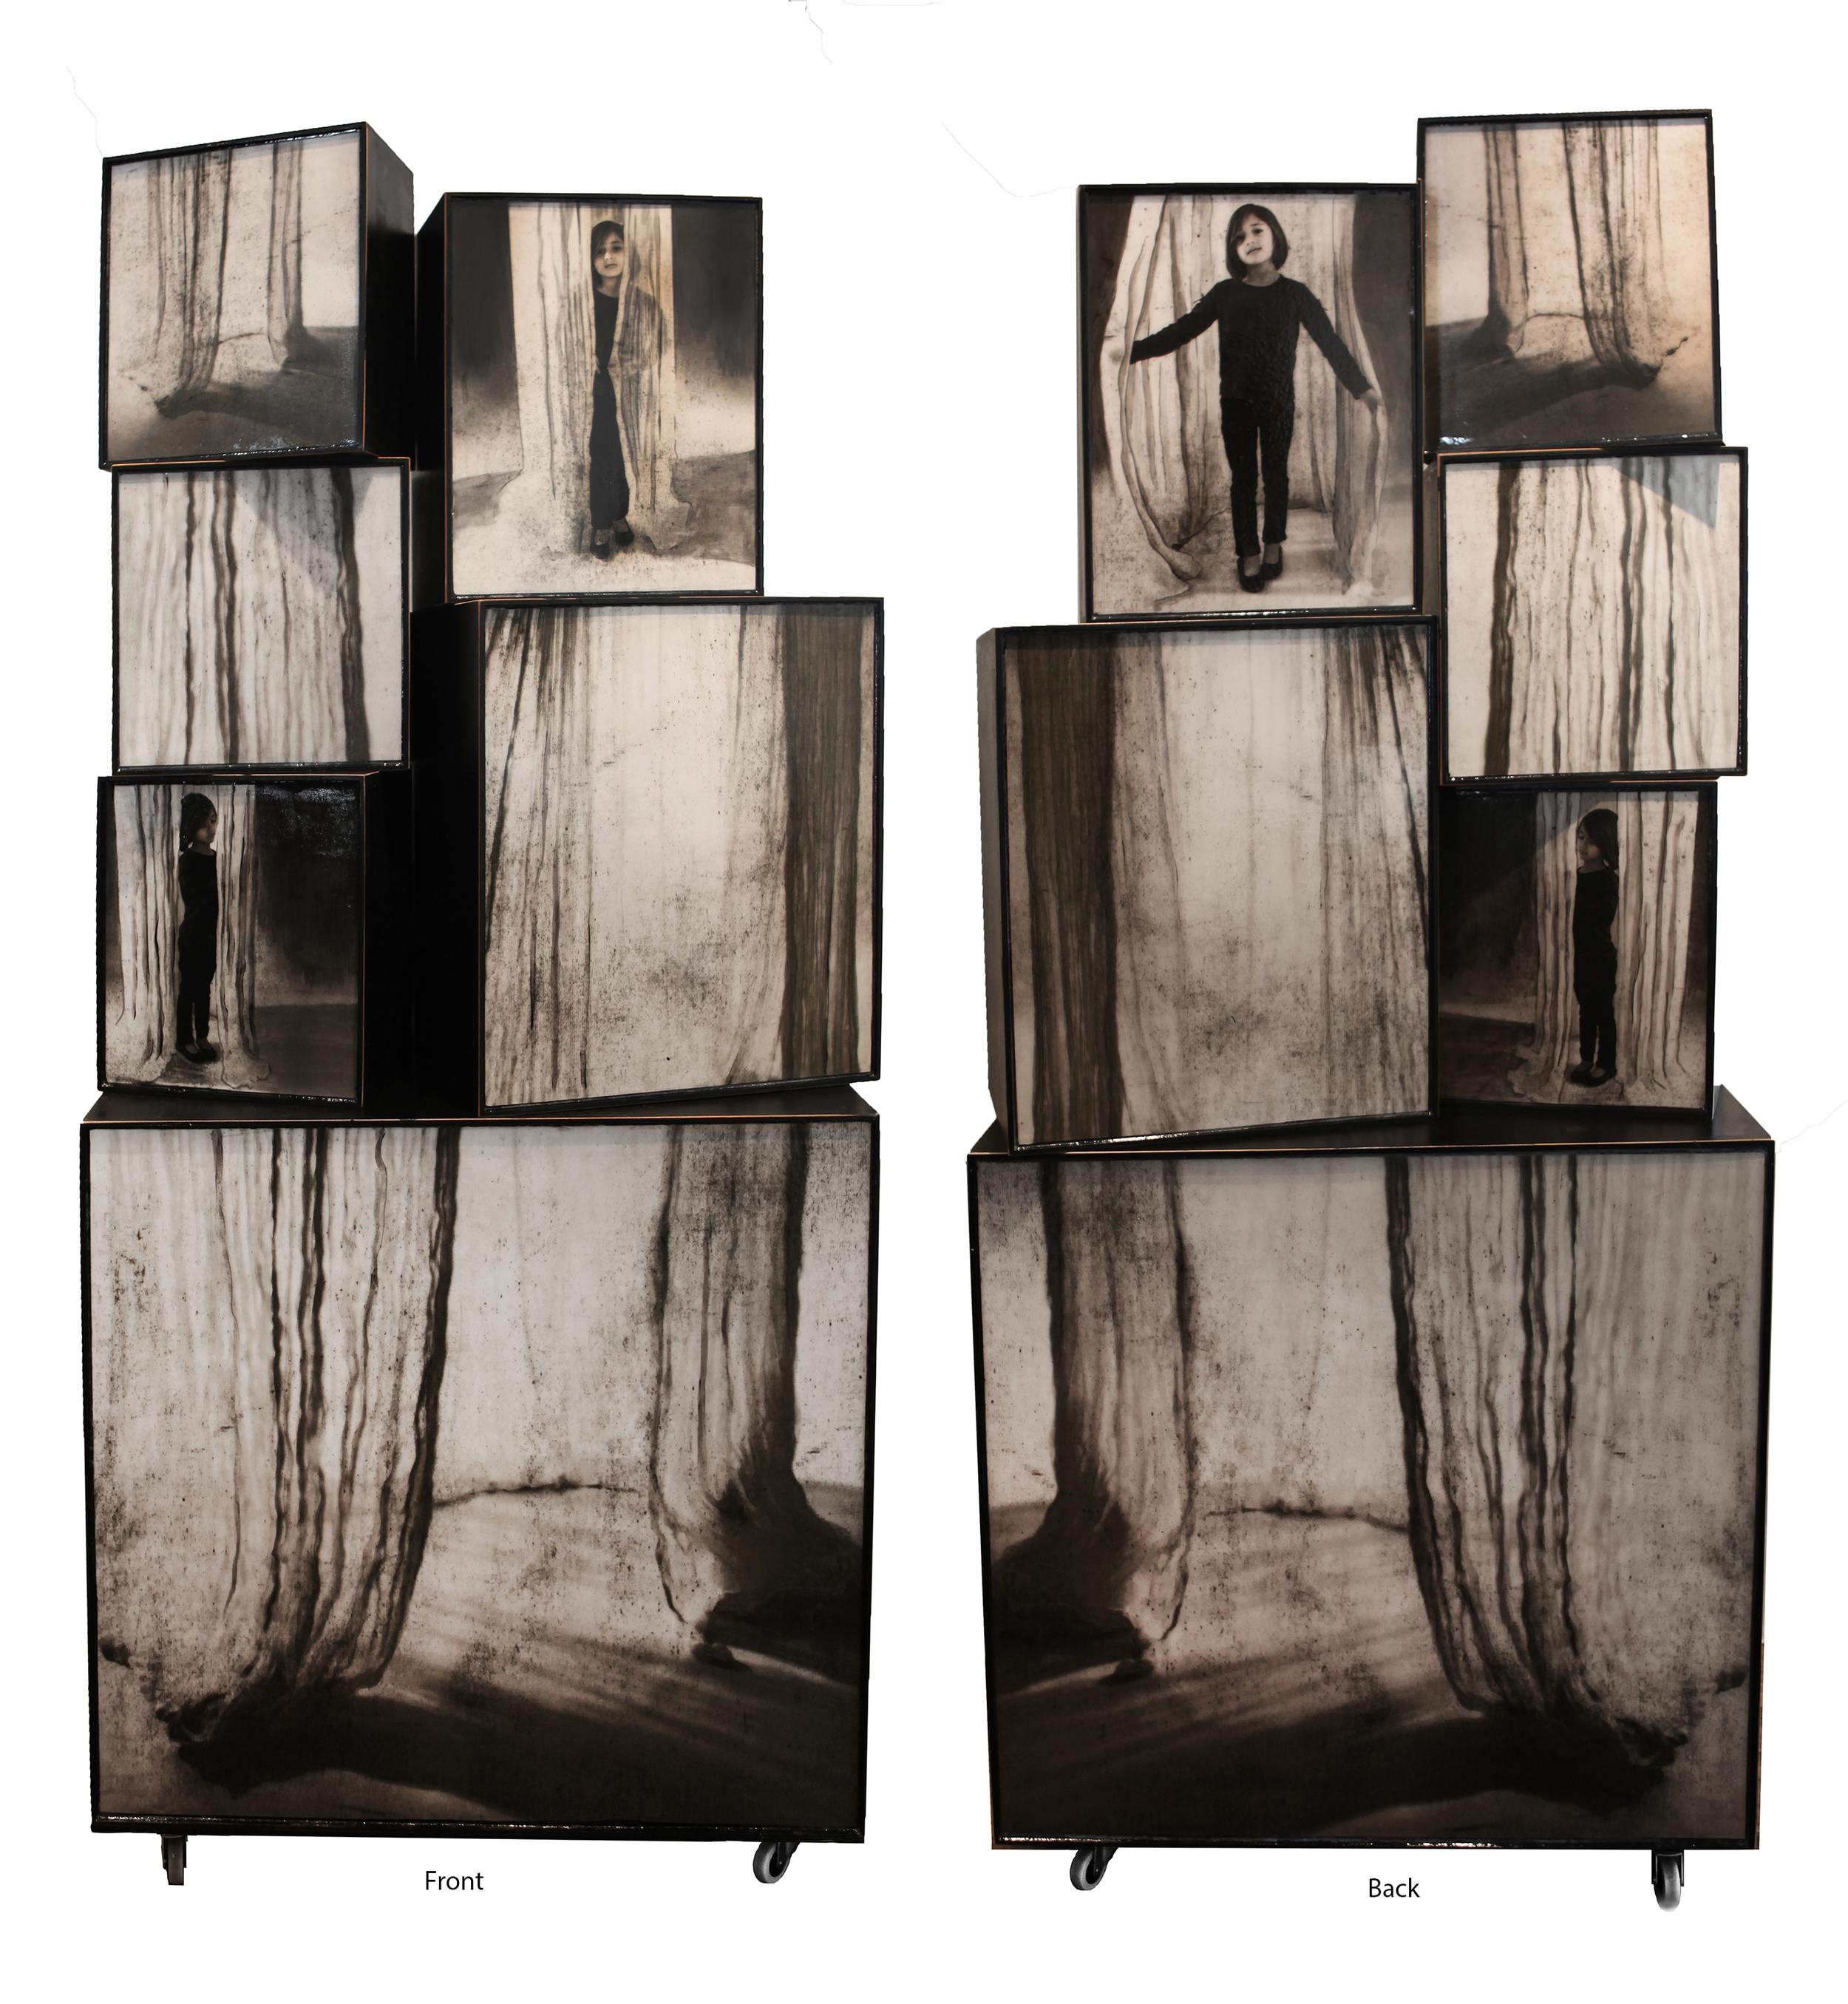 "Shroud, 2015, Mixed Media Construction, 75.75"" x 34"" x 17.5"" (Samantha)"